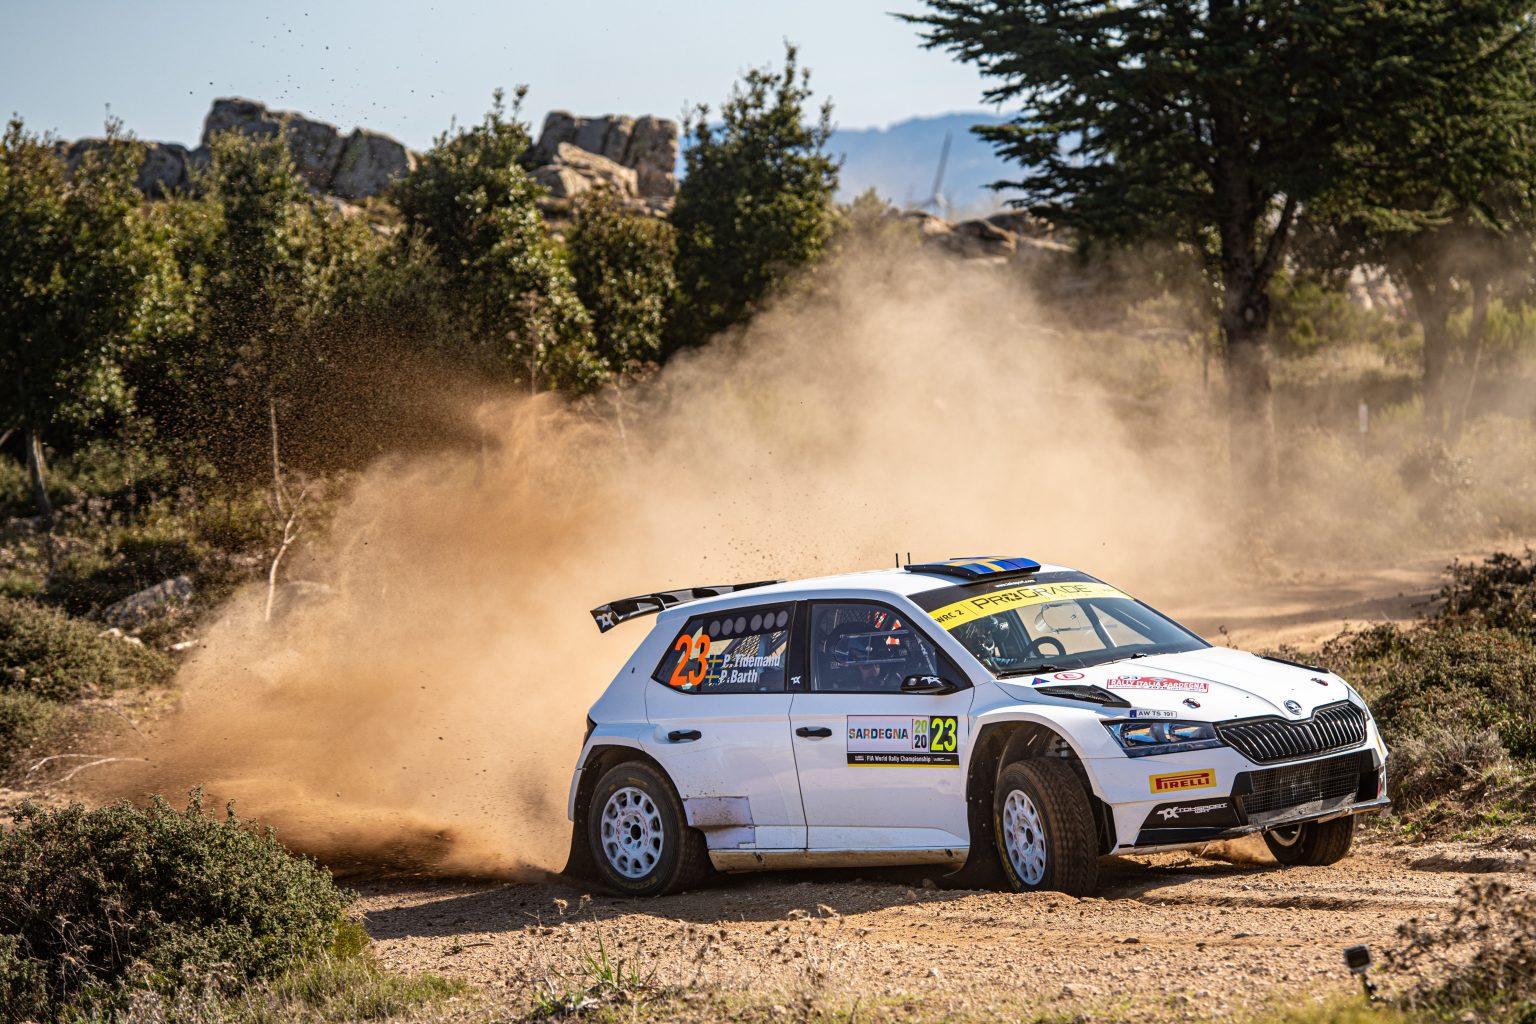 2. leg Rally Italia Sardegna 2020, (ITA), WRC 2, Pontus Tidemand/Patrik Barth (SWE/SWE)